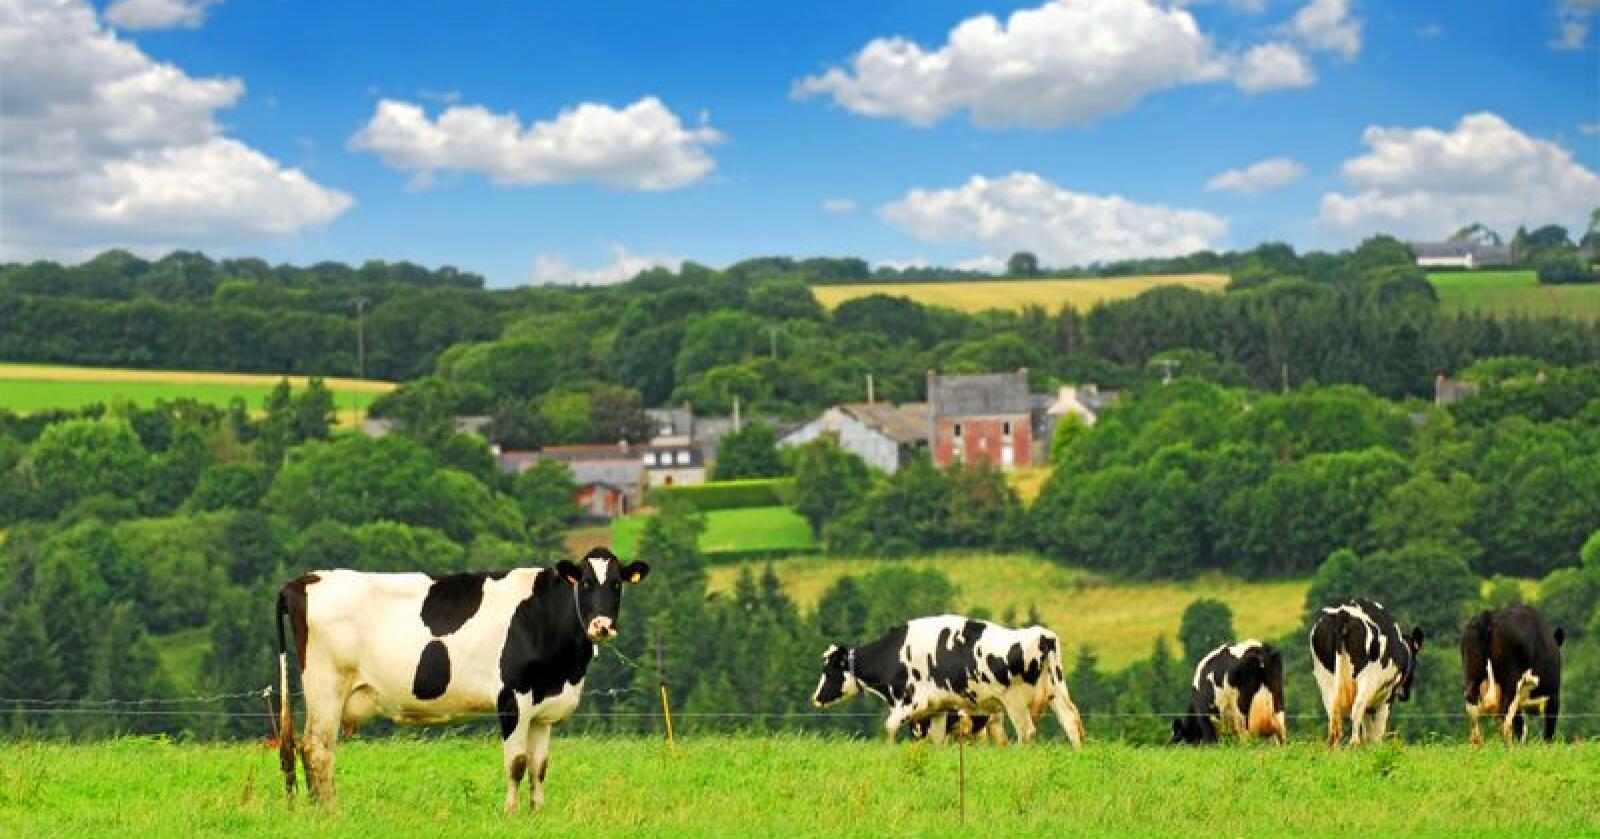 Kyr på beite i Bretagne i Frankrike. Illustrasjonsfoto: Elena Elisseeva / Mostphotos